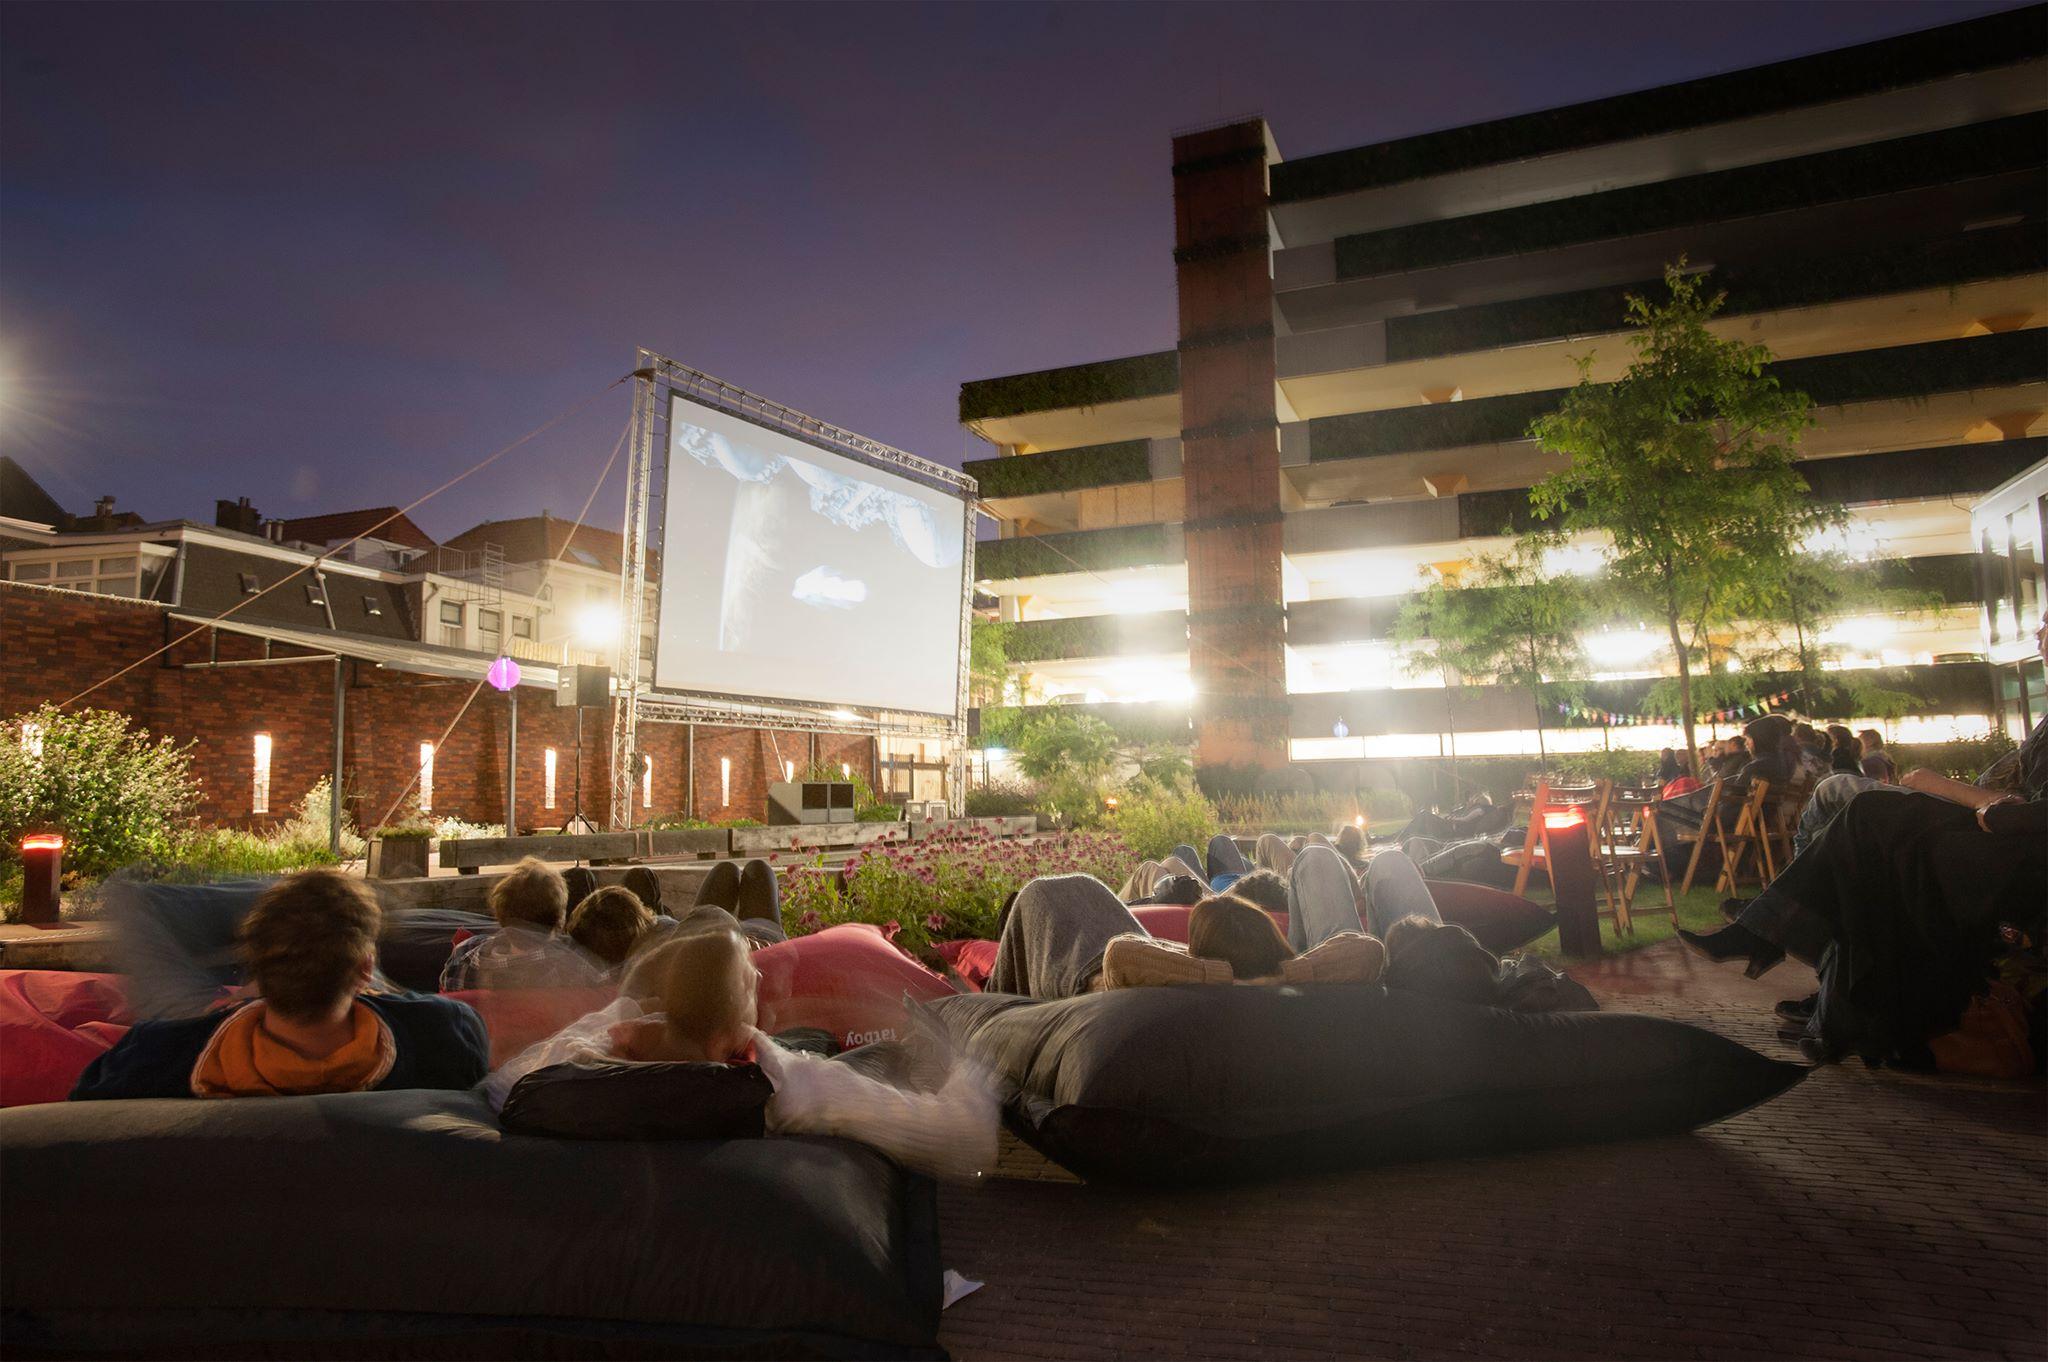 Open Air Cinema Het Nutshuis 2019